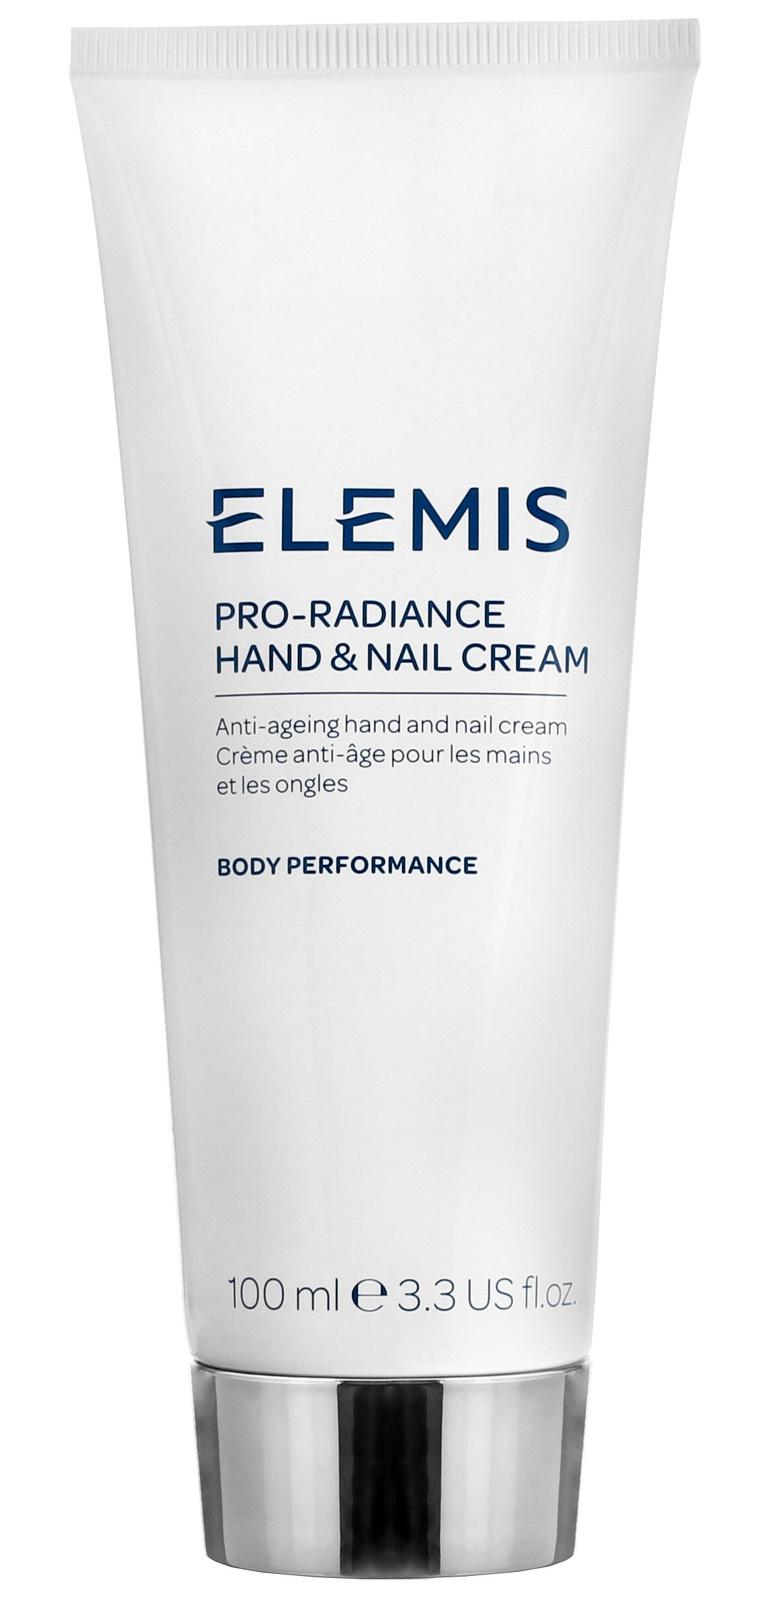 Elemis Pro-Radiance Hand And Nail Cream